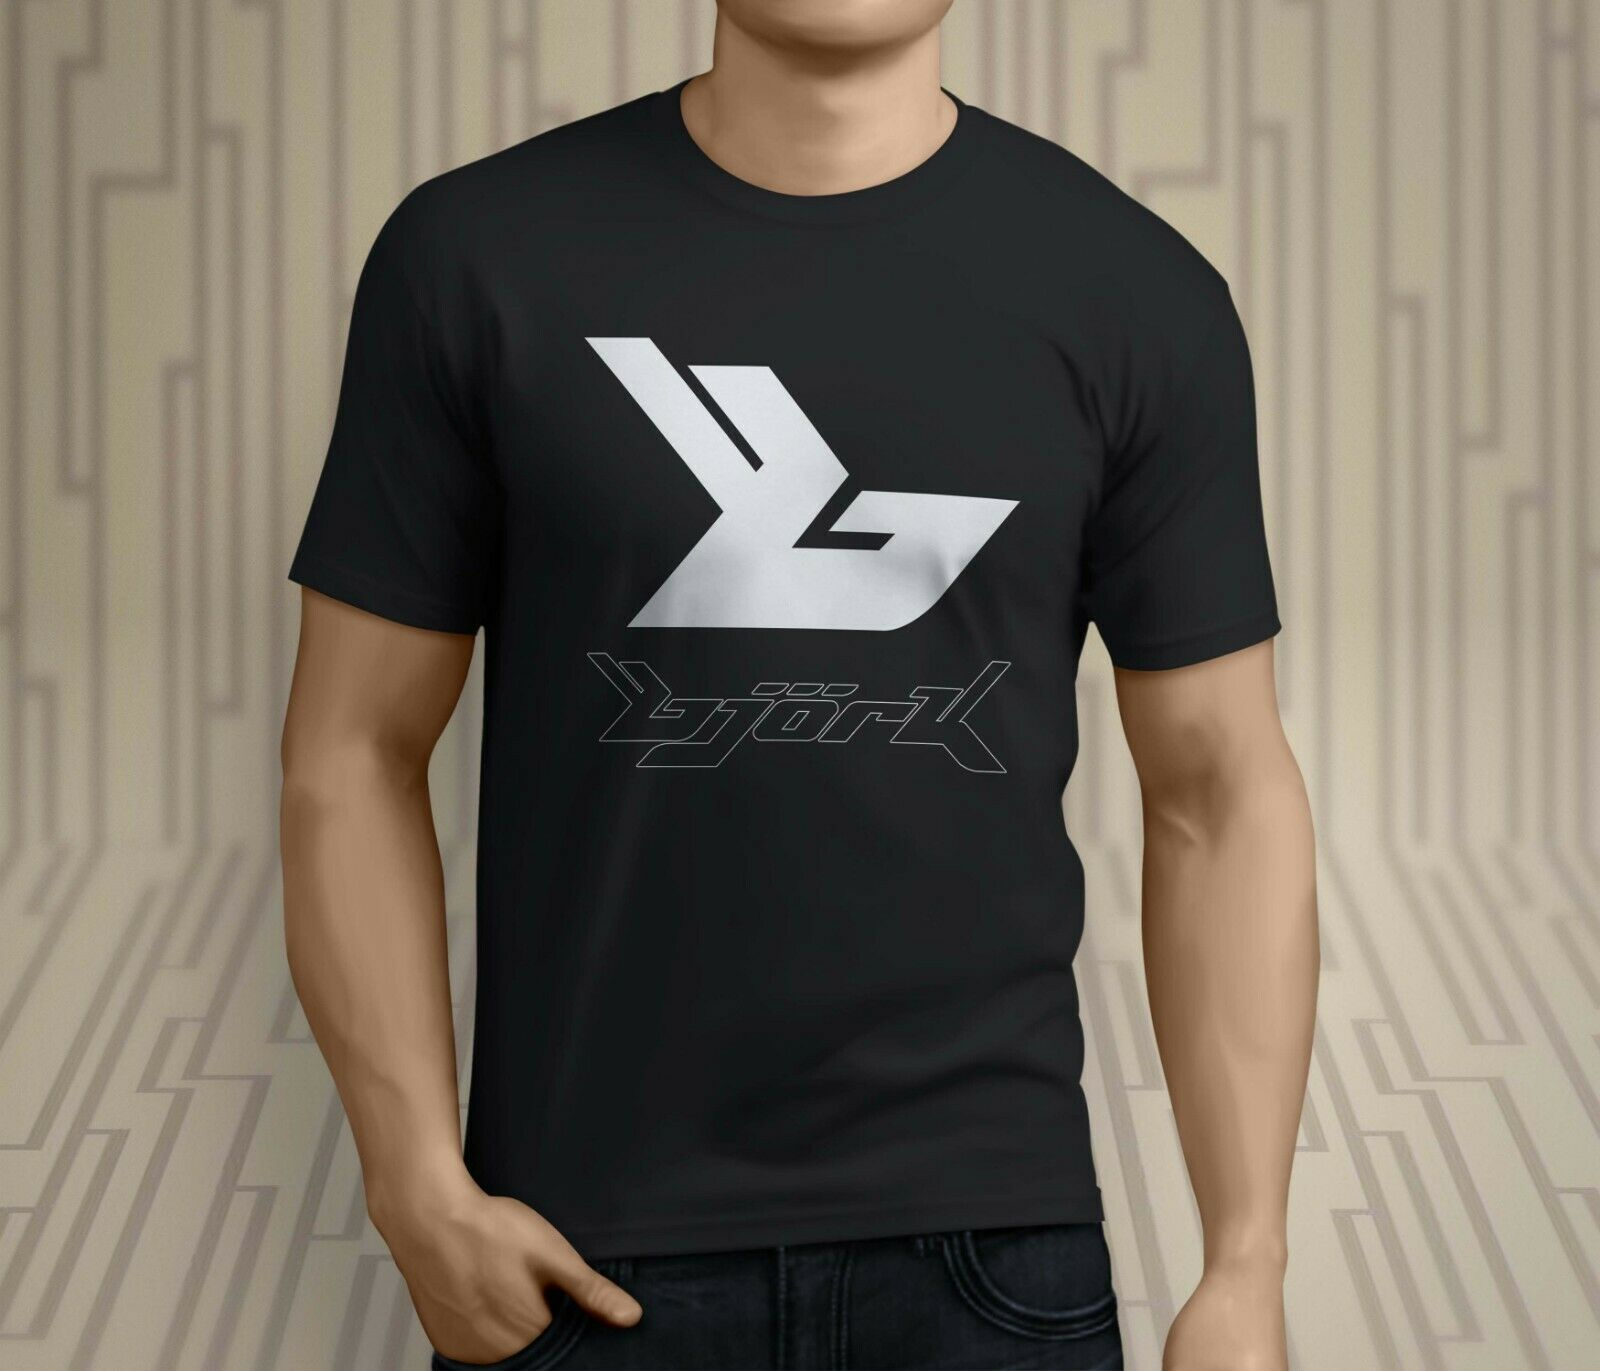 Novo popular bjork homogenic masculino t camisa tamanho s 3x